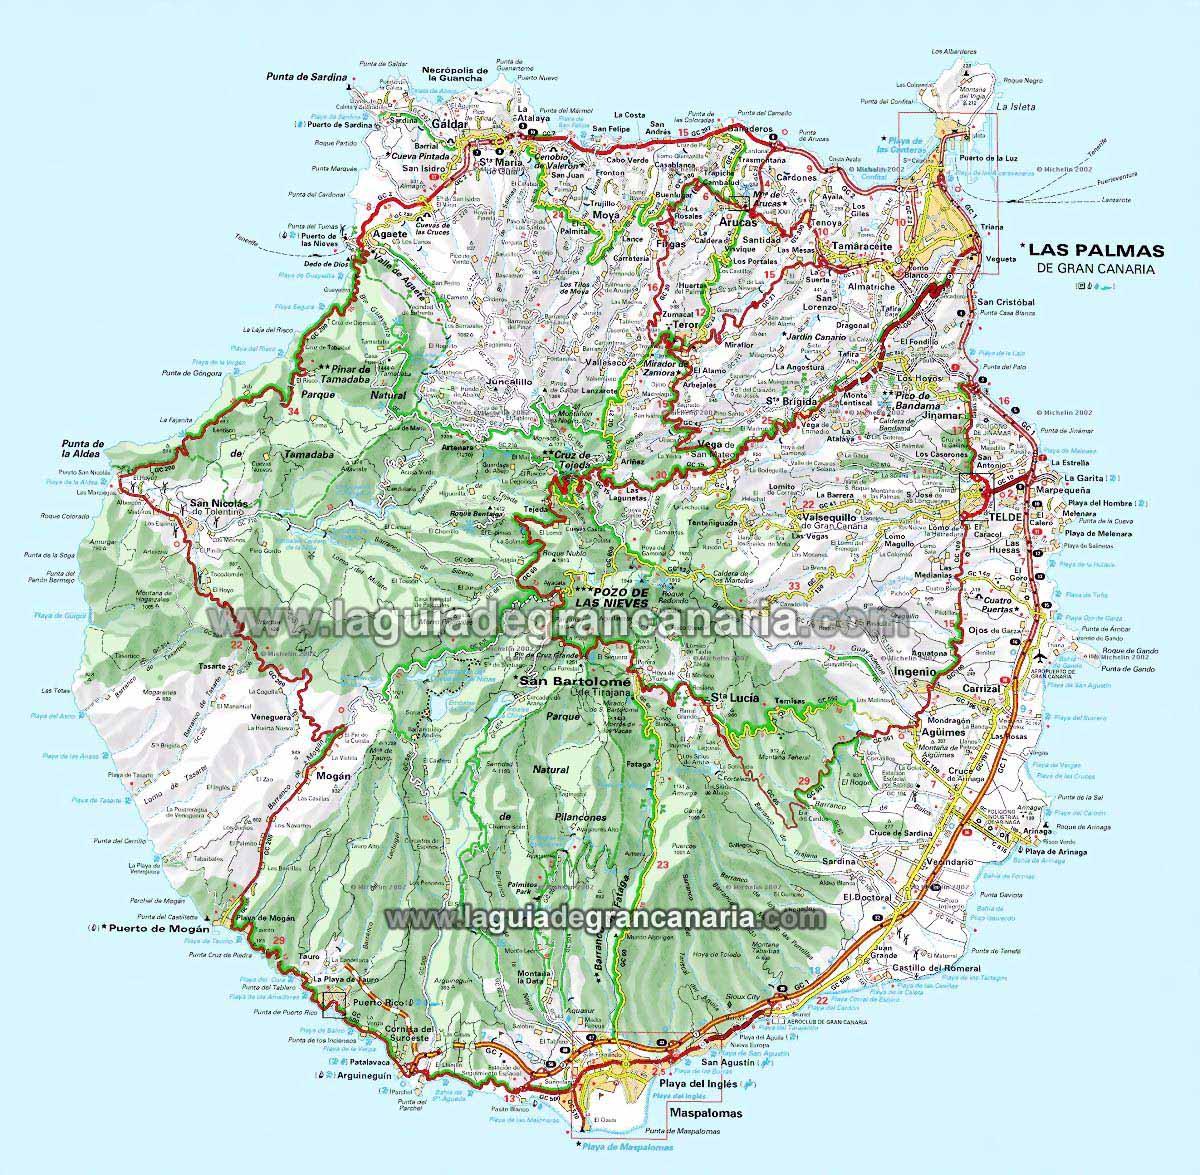 isla de canaria: